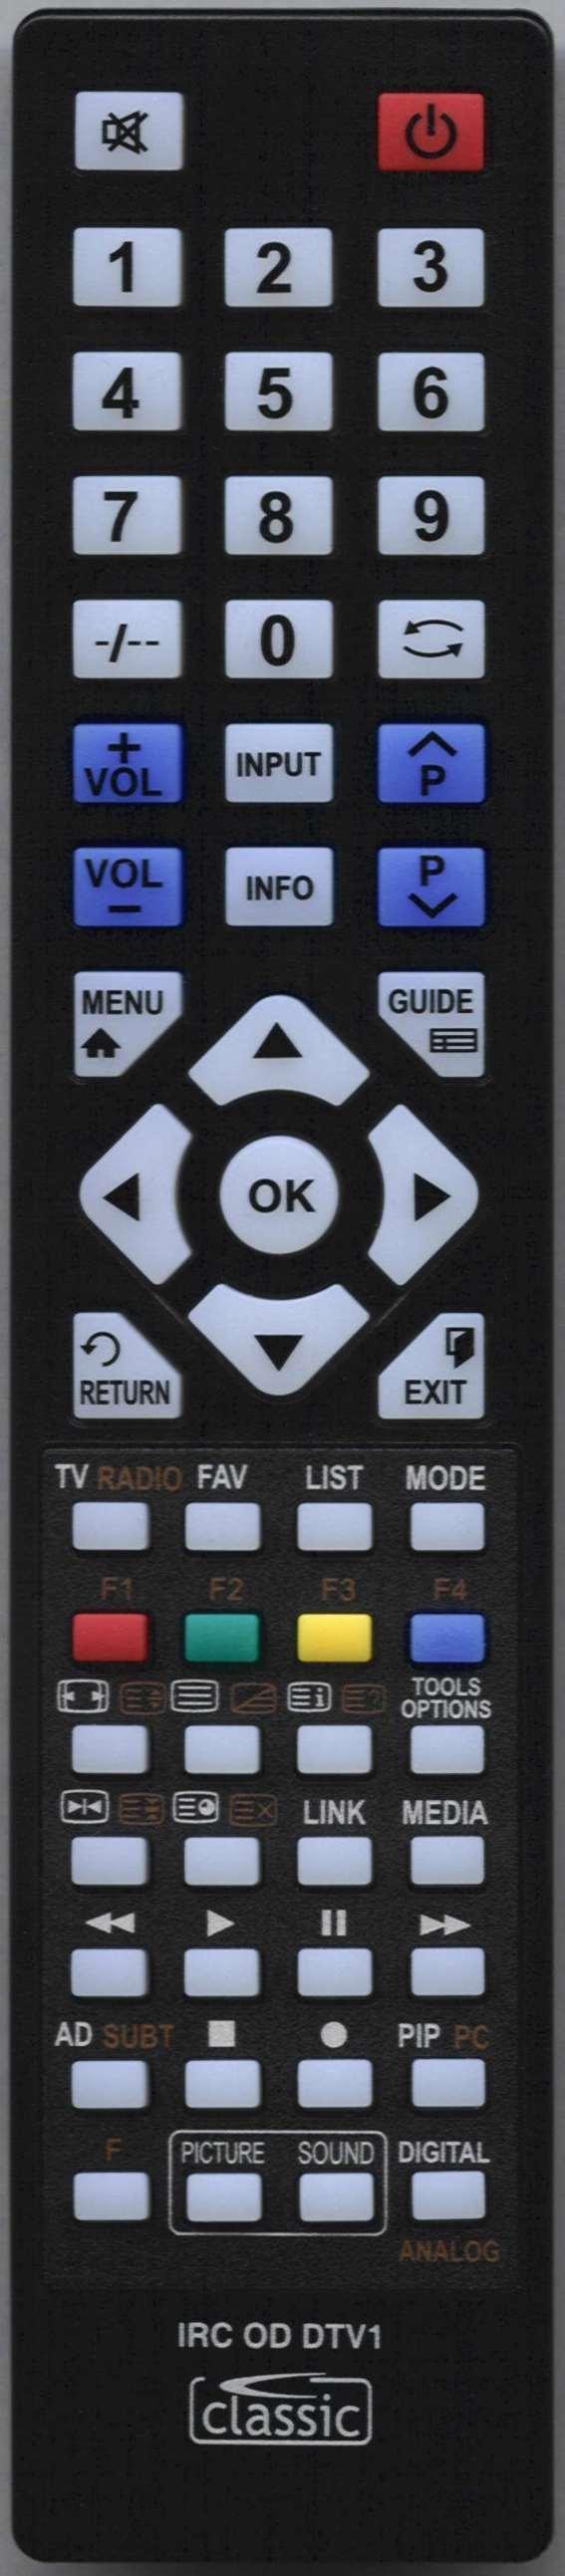 WHARFEDALE LY19T1CWW Remote Control